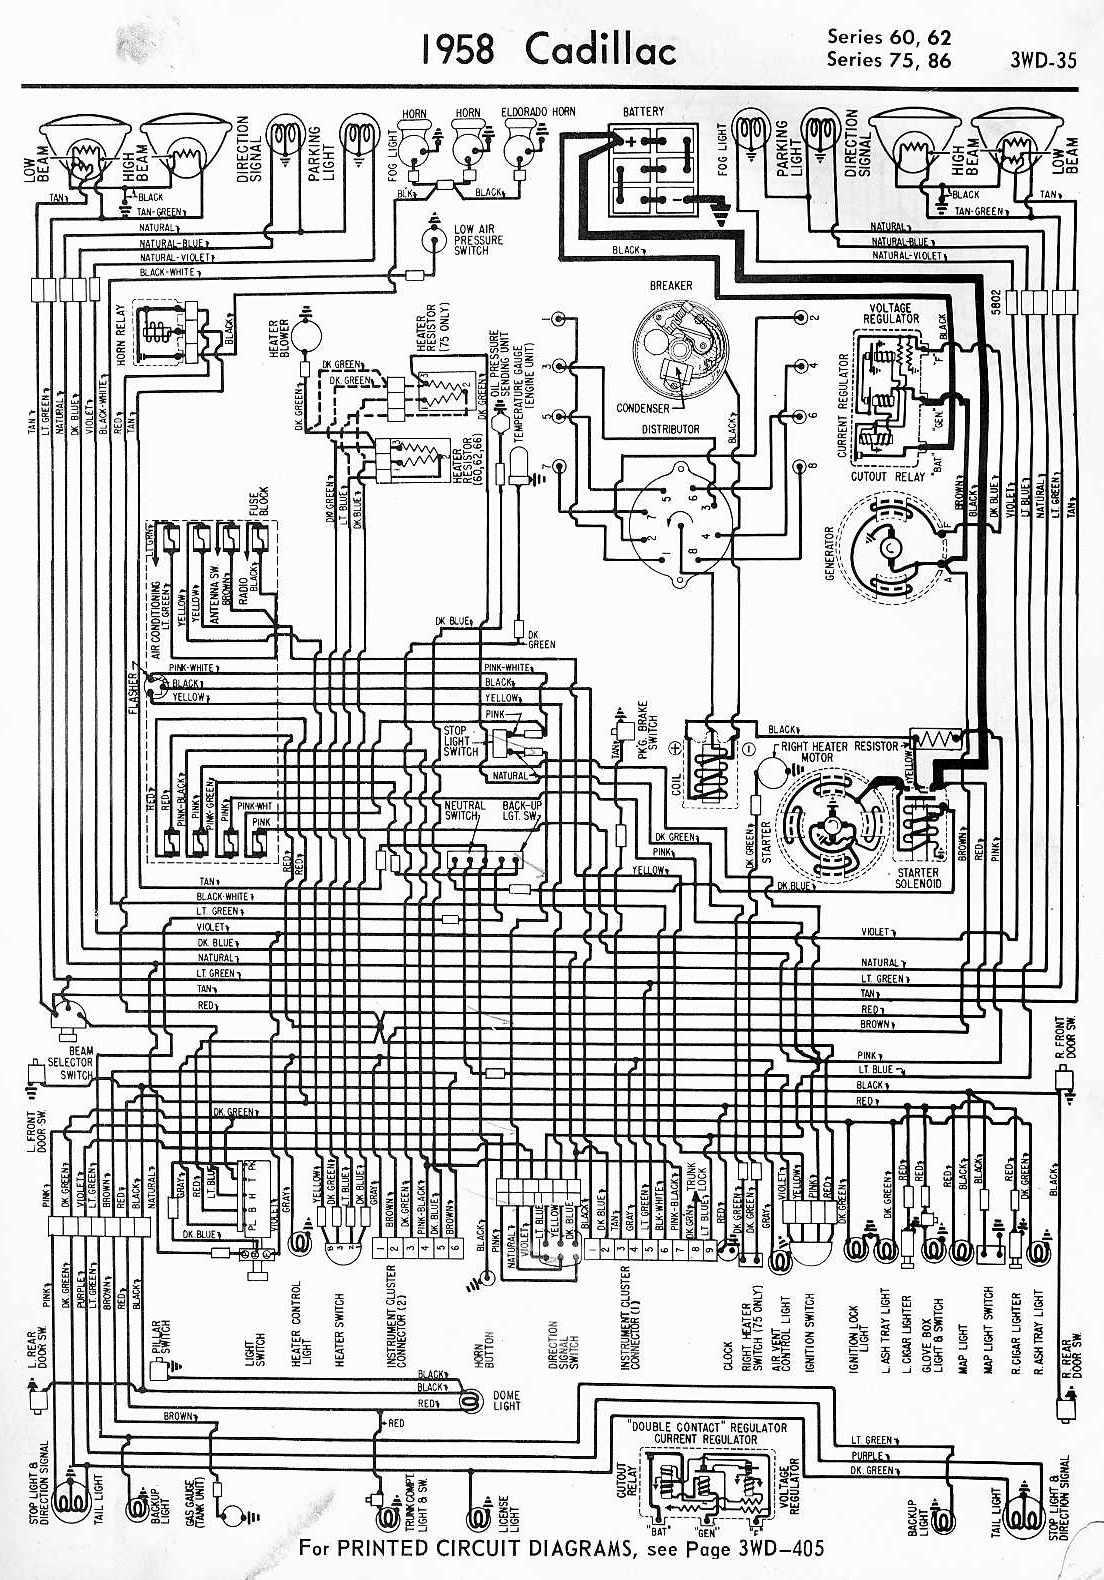 cadillac car manuals wiring diagrams pdf fault codes. Black Bedroom Furniture Sets. Home Design Ideas